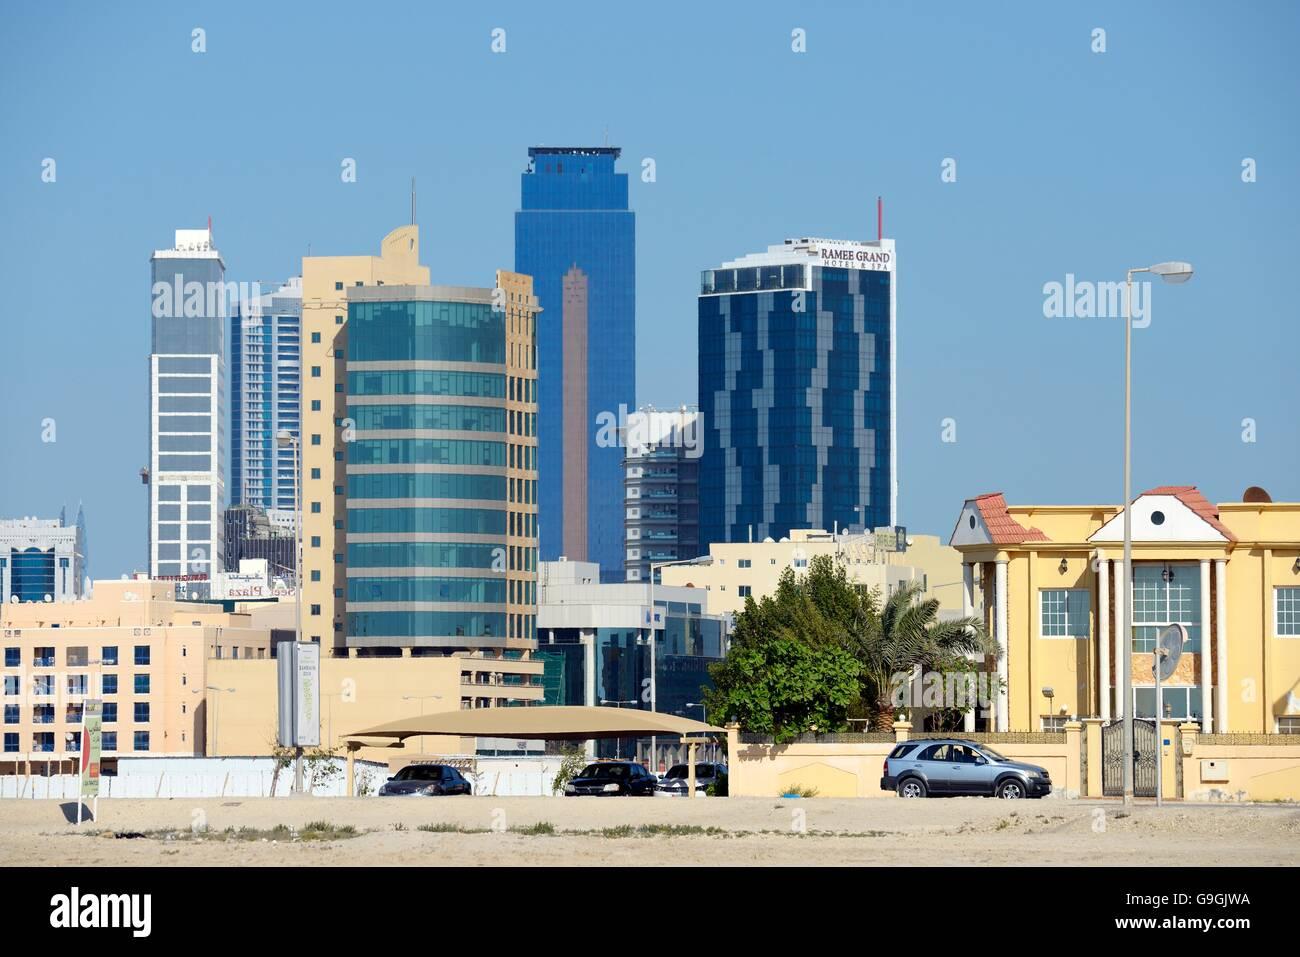 Manama, Bahrain Seef district. Guardando ad est al ramee grand hotel e la torre almoayyed aka the dark tower Immagini Stock